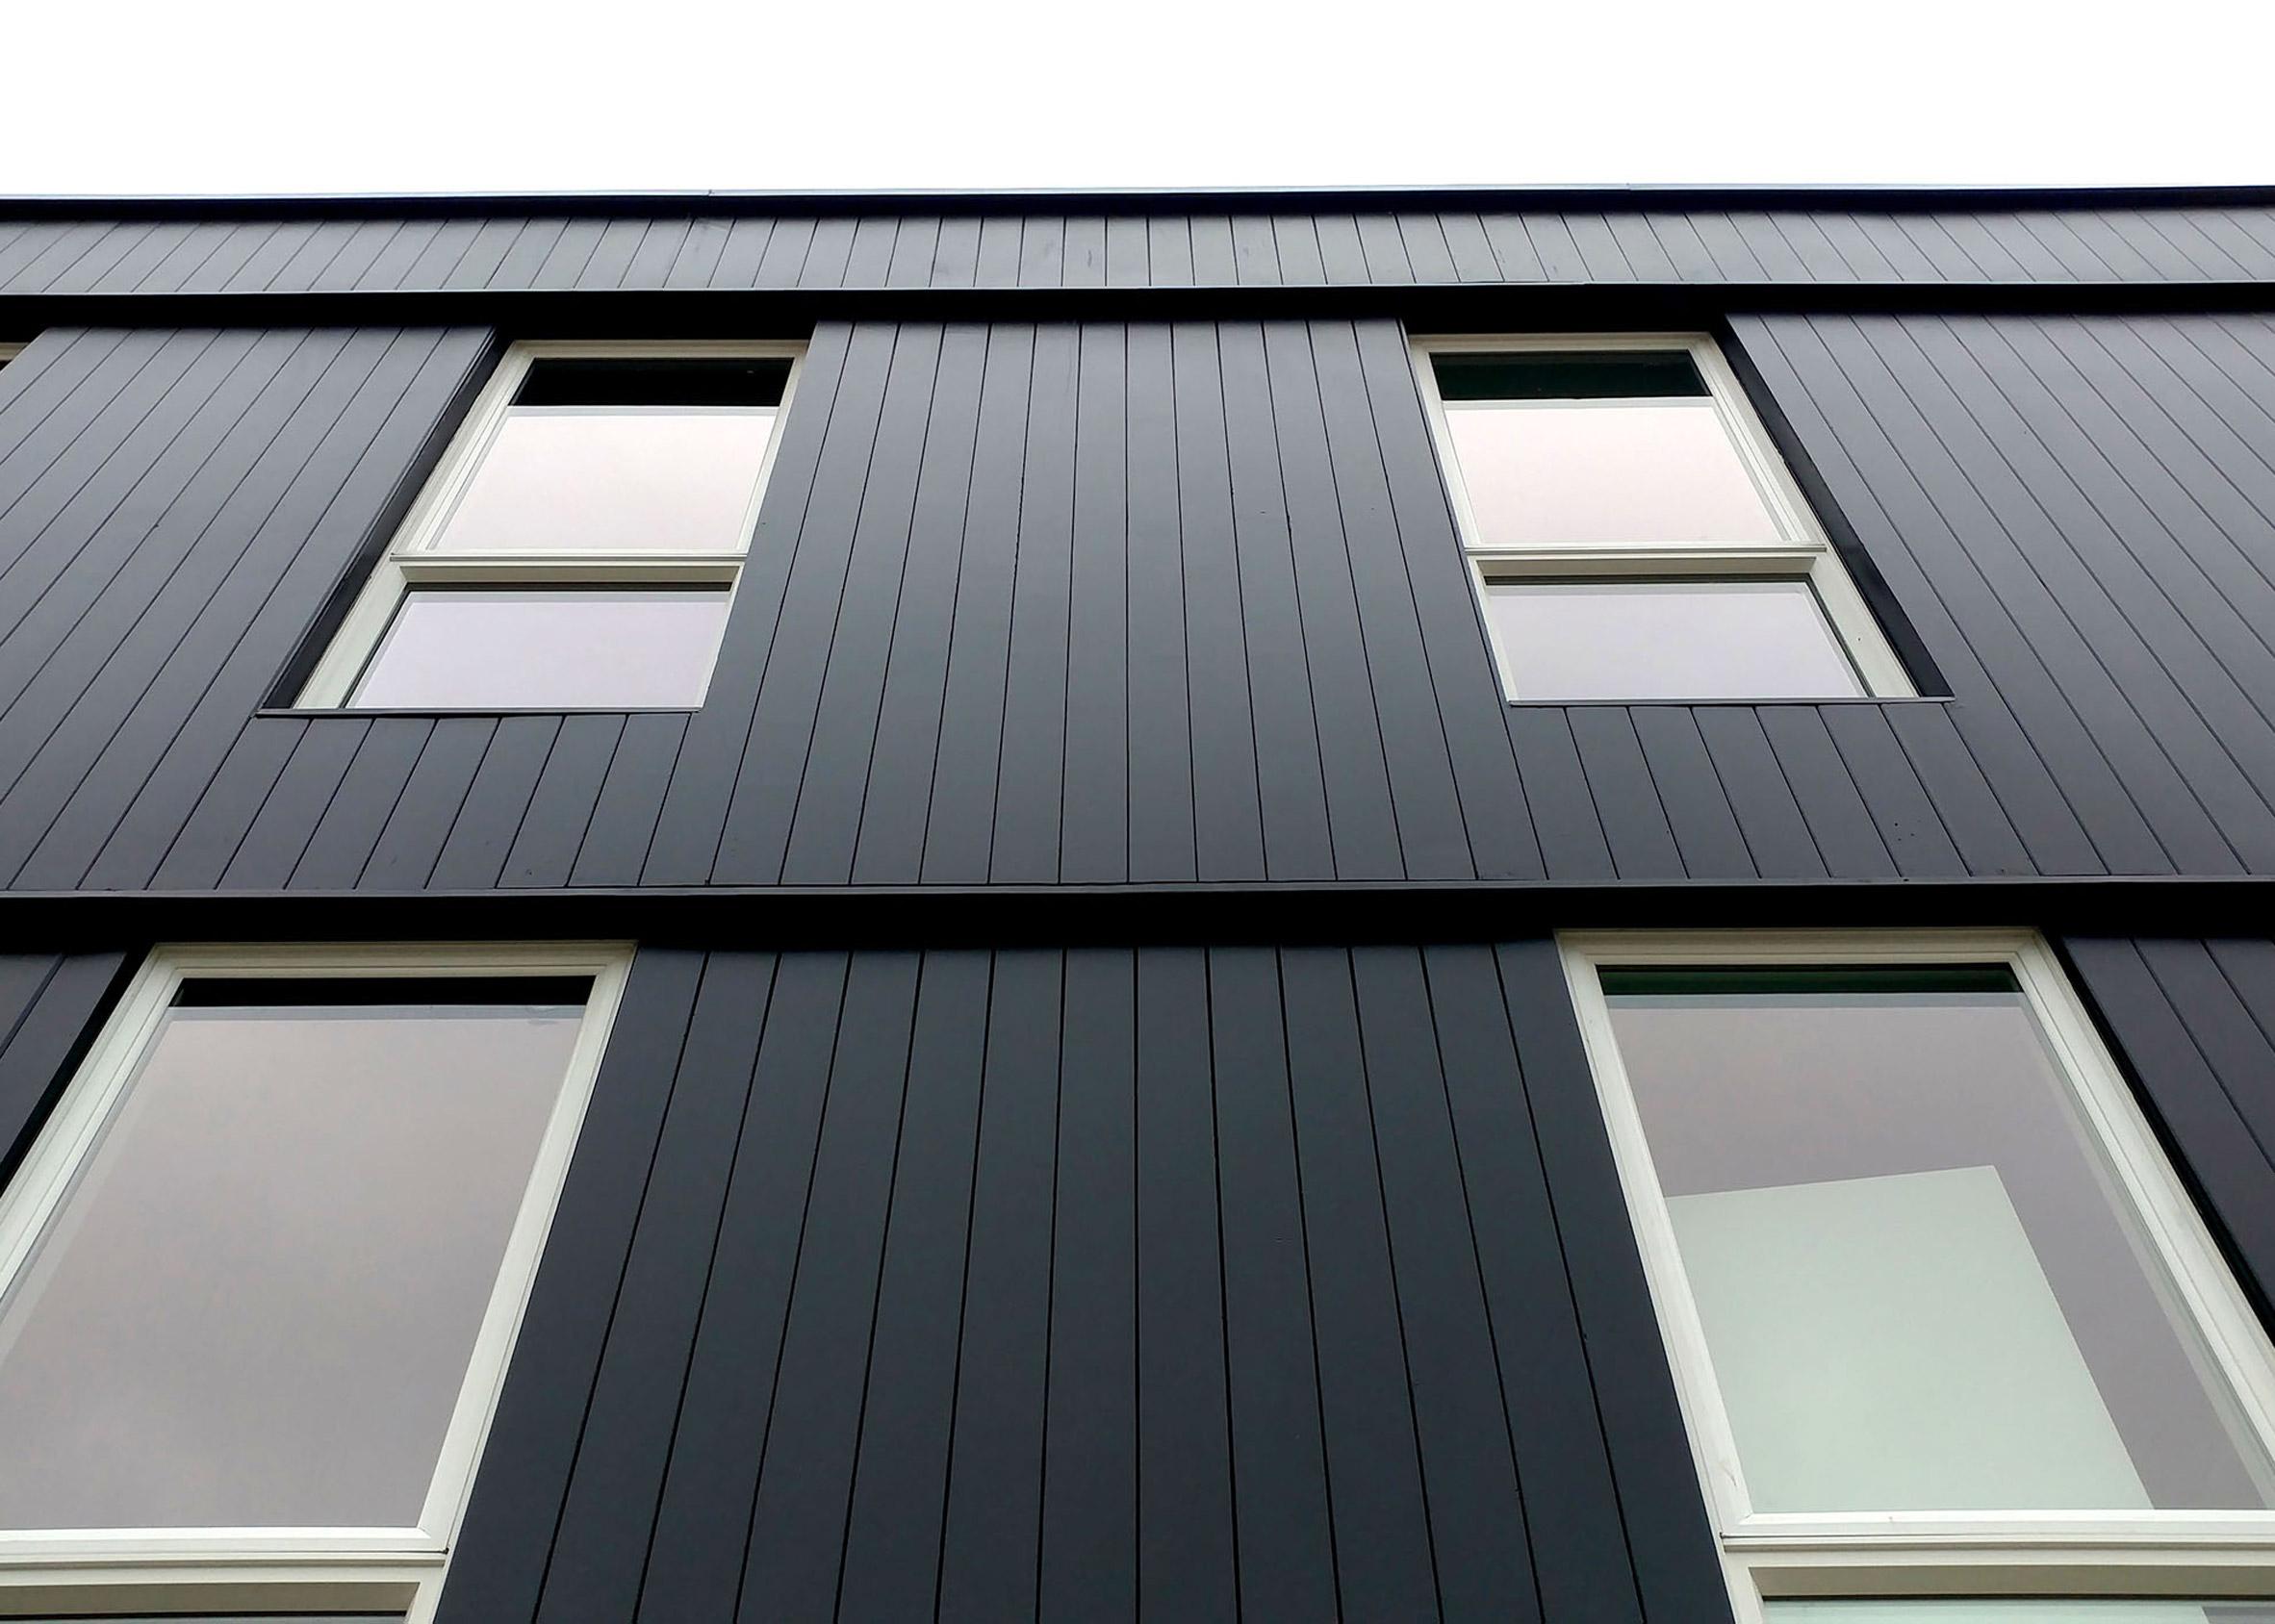 Jarrett Street 12, Portland, Oregon by Architecture Building Culture